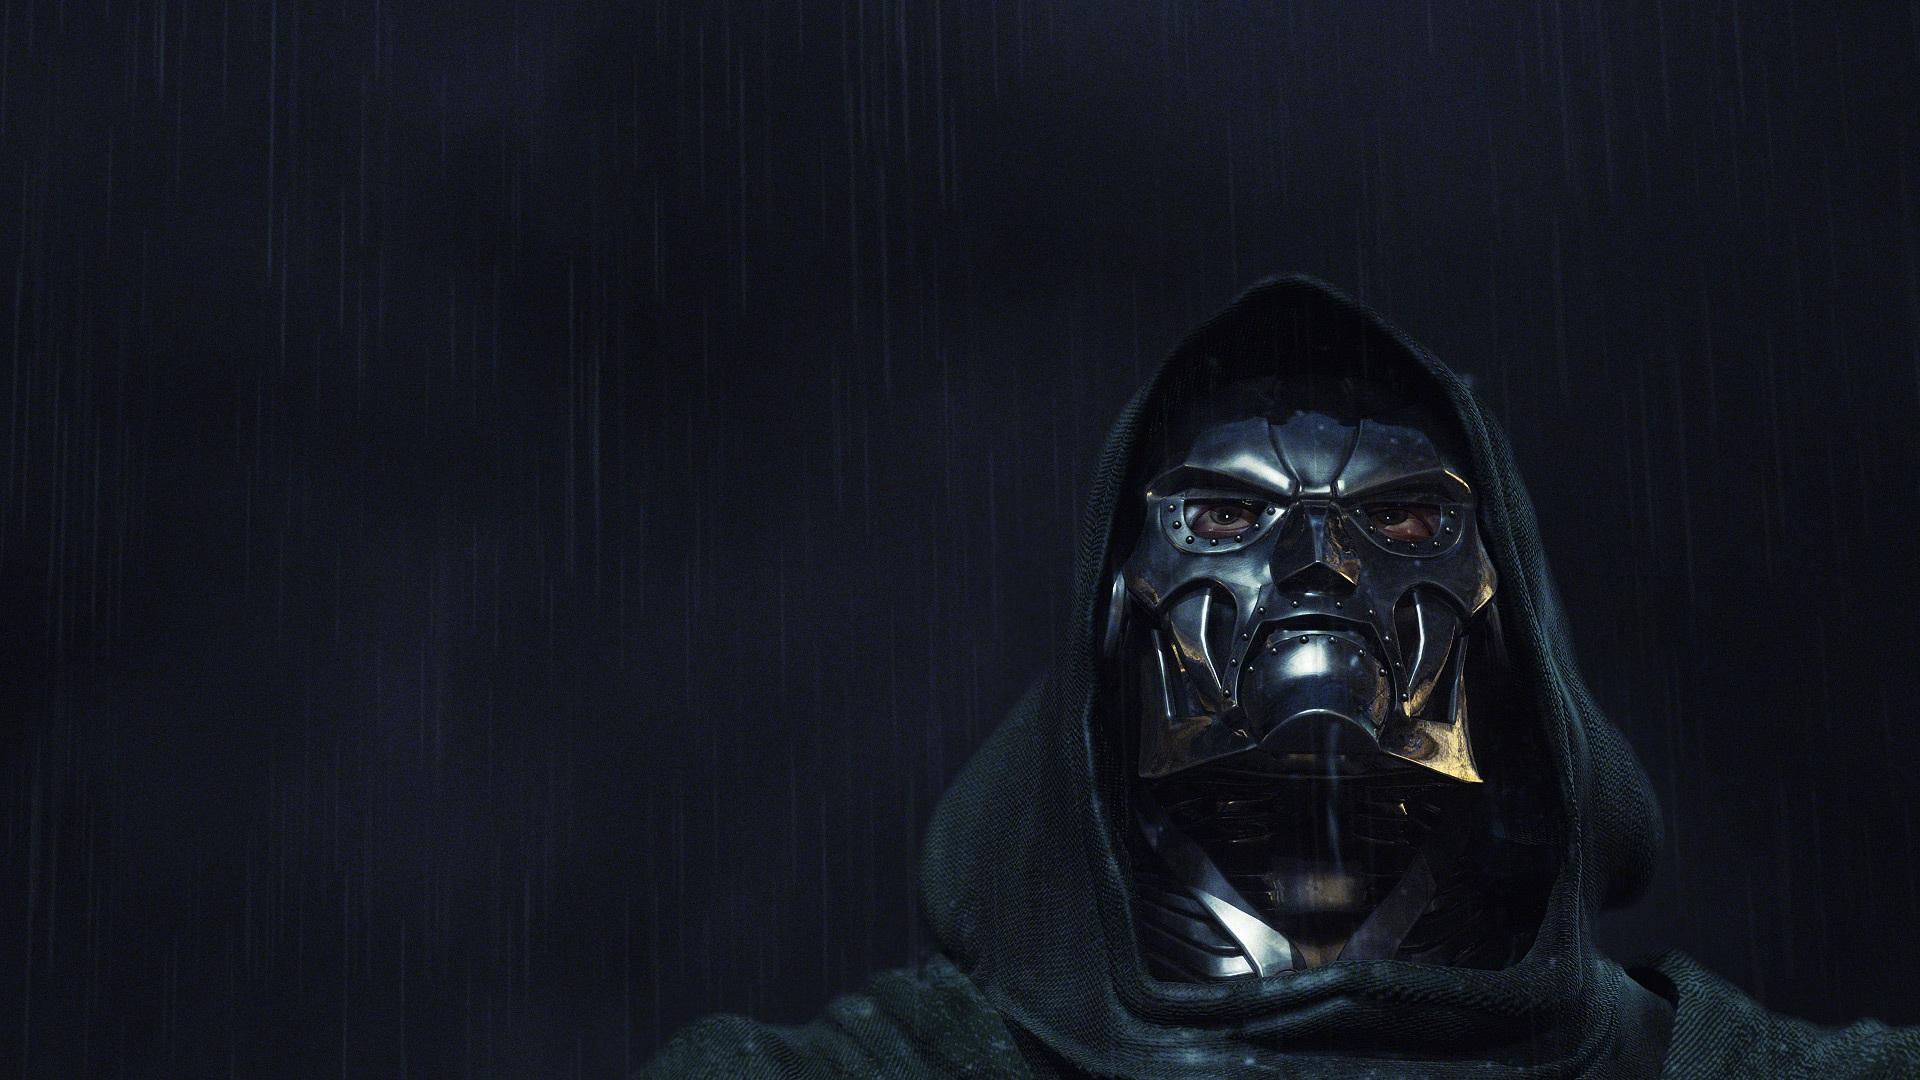 Doom HD Wallpaper | Background Image | 1920x1080 | ID ...